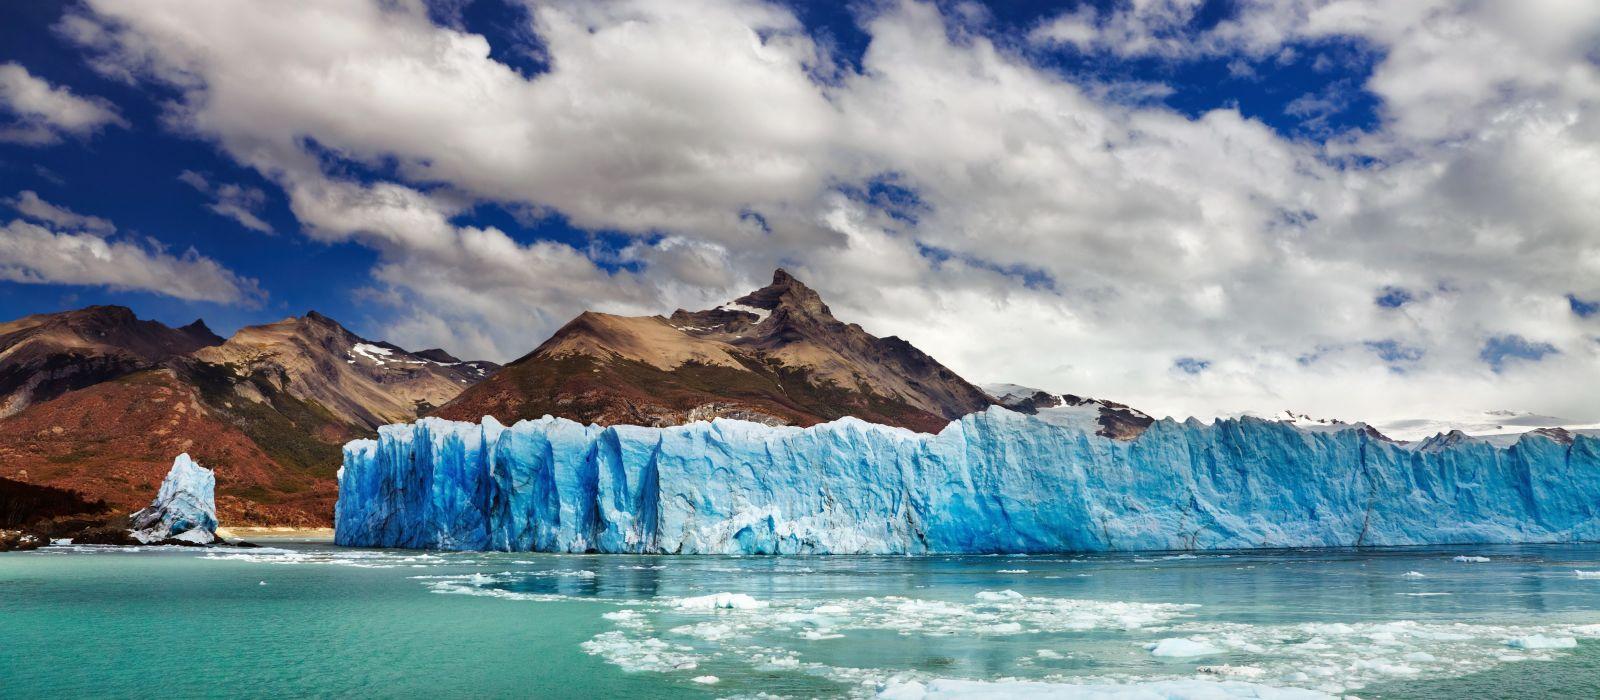 Glaciers, Wildlife & Waterfalls in Argentina Tour Trip 8